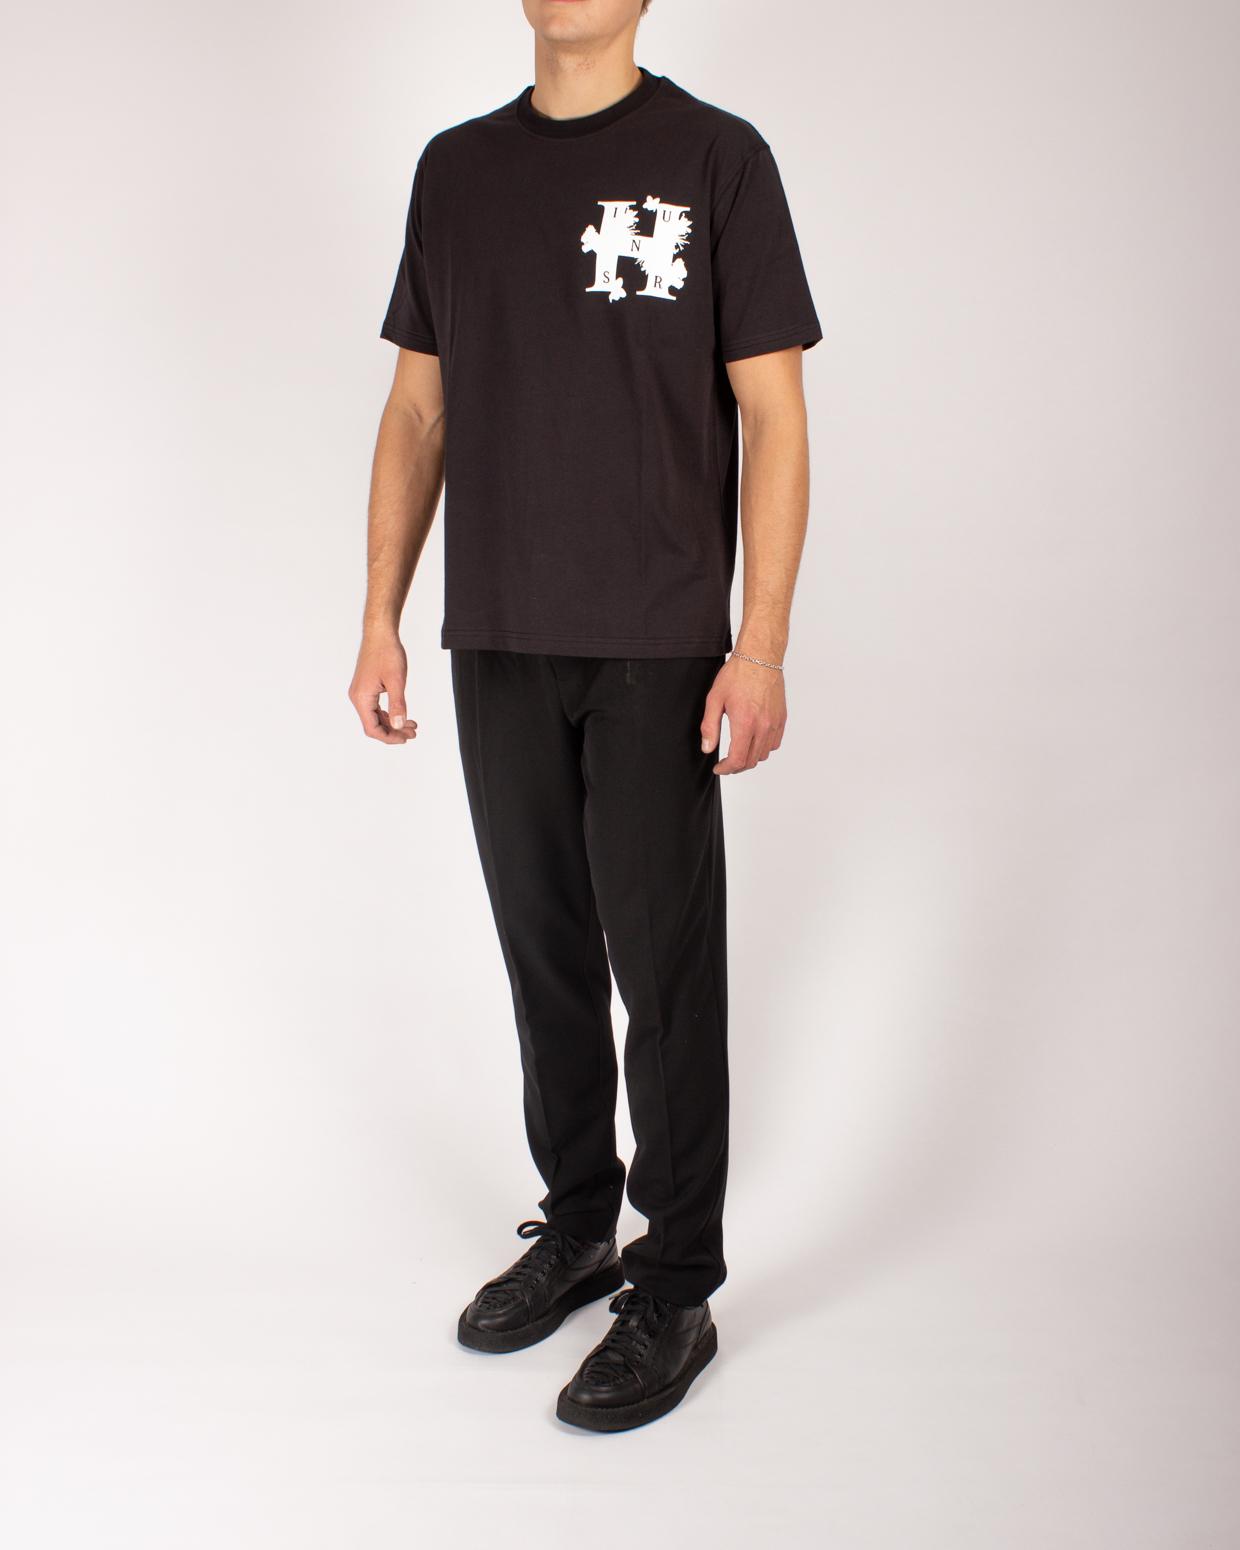 ISNURH Heritage T-shirt, Sort, M